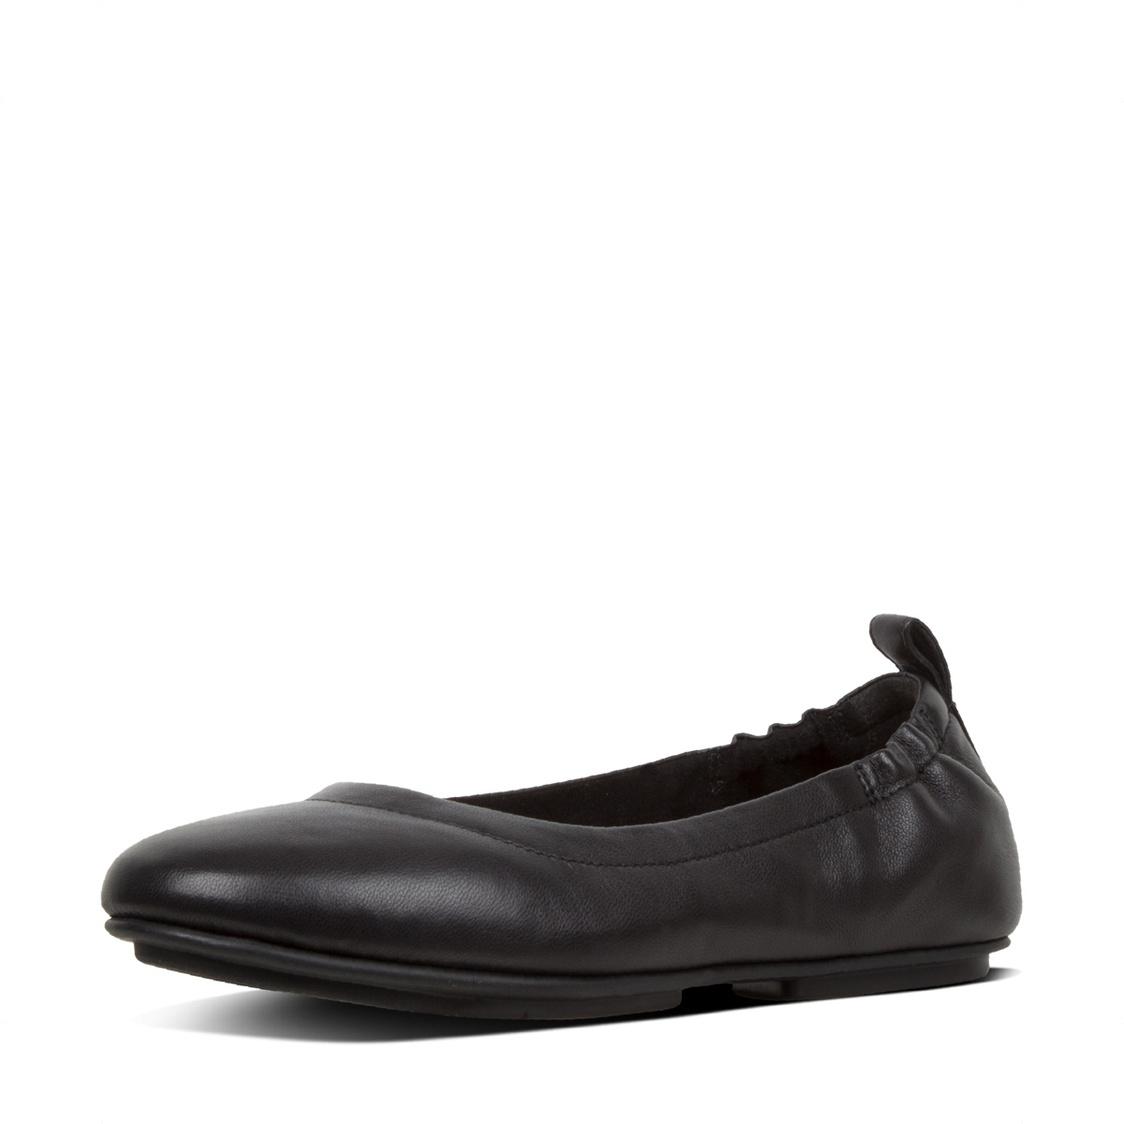 Fitflop Allegro Leather Ballerinas Black